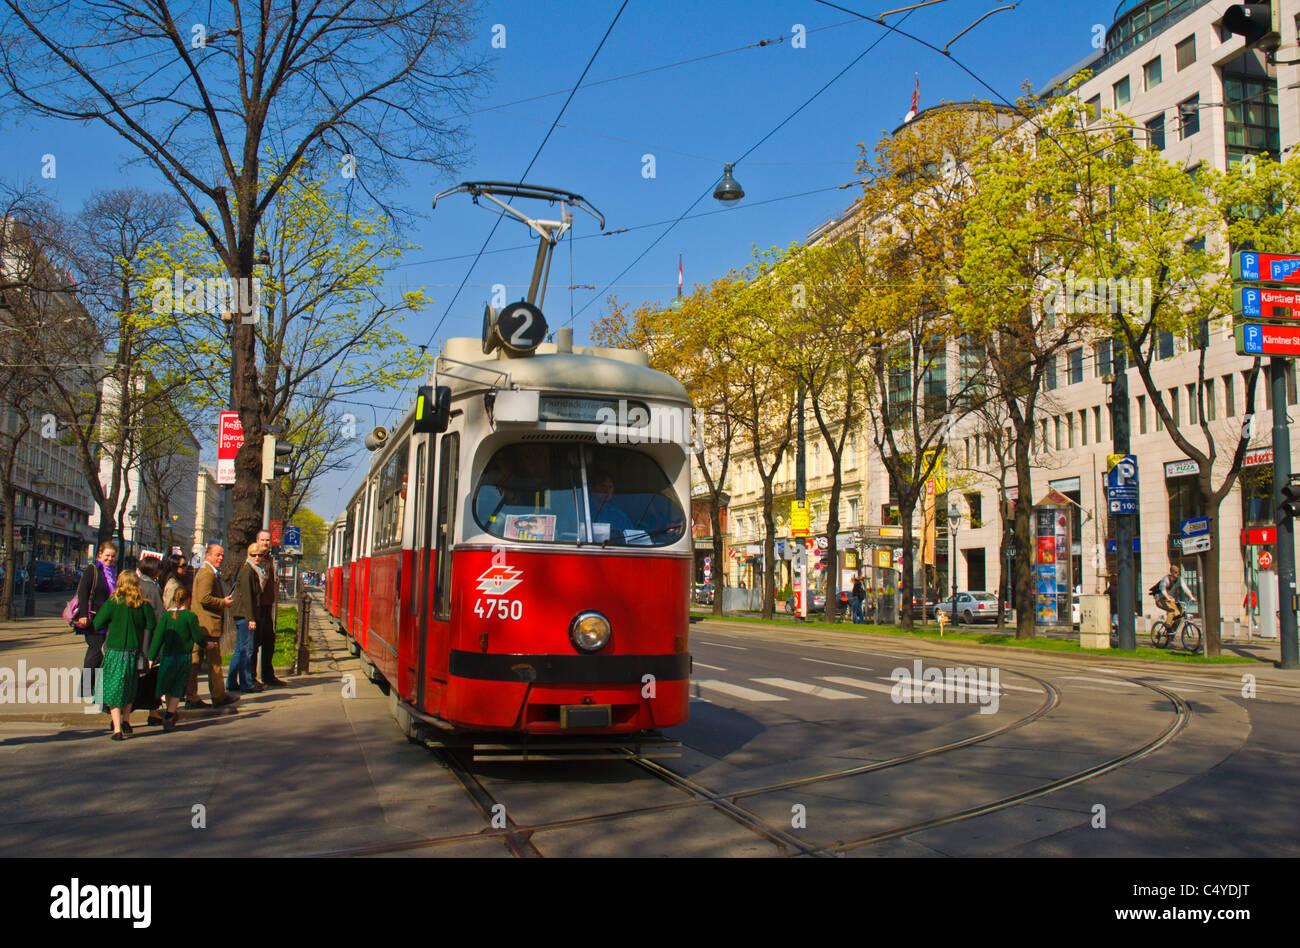 Straßenbahn auf Operring Ringstraße Straße Innere Stadt central Vienna Austria Mitteleuropa Stockbild